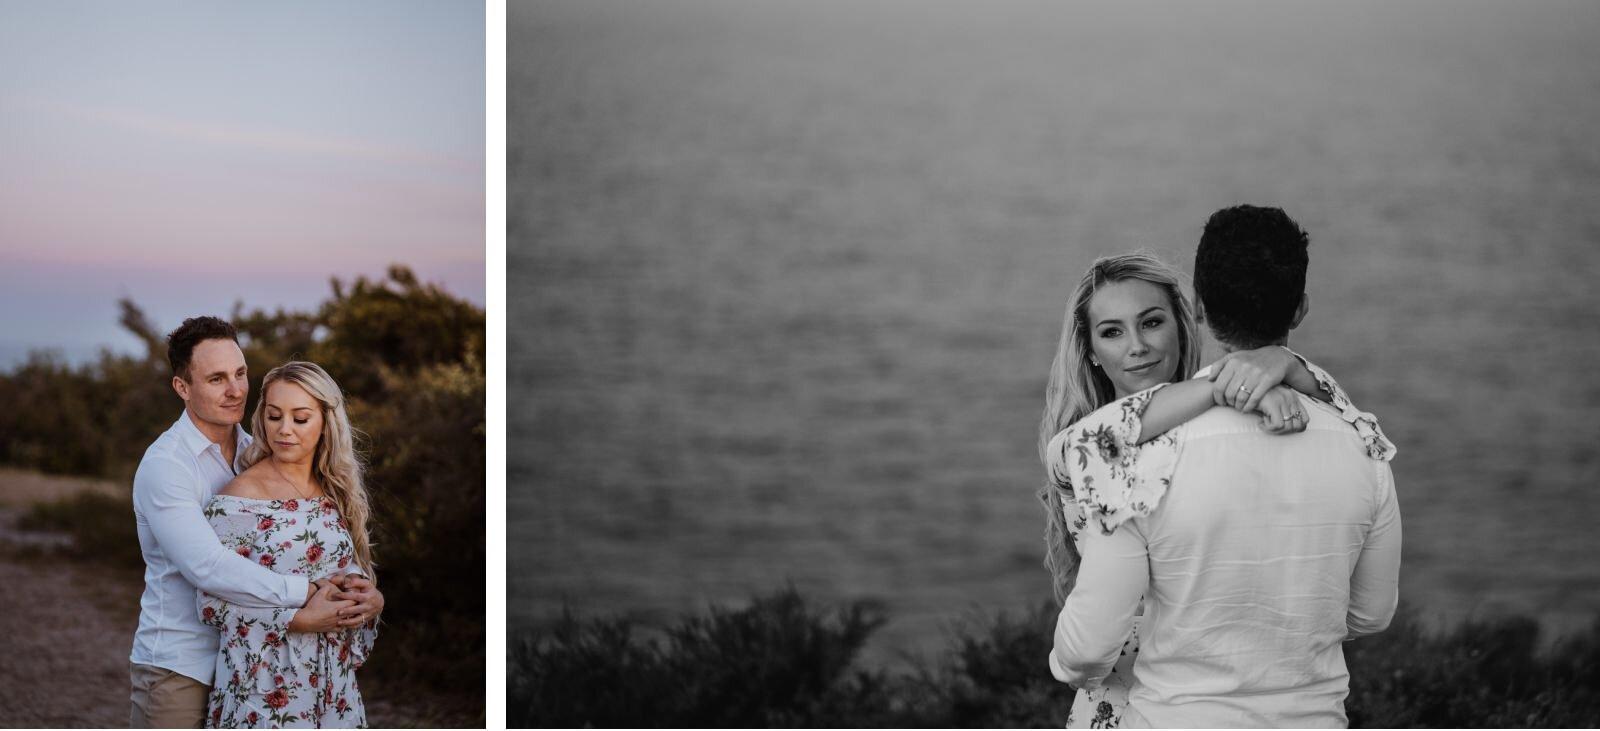 newcastle-wedding-photographer-dudley-engagement-shoot-22.jpg